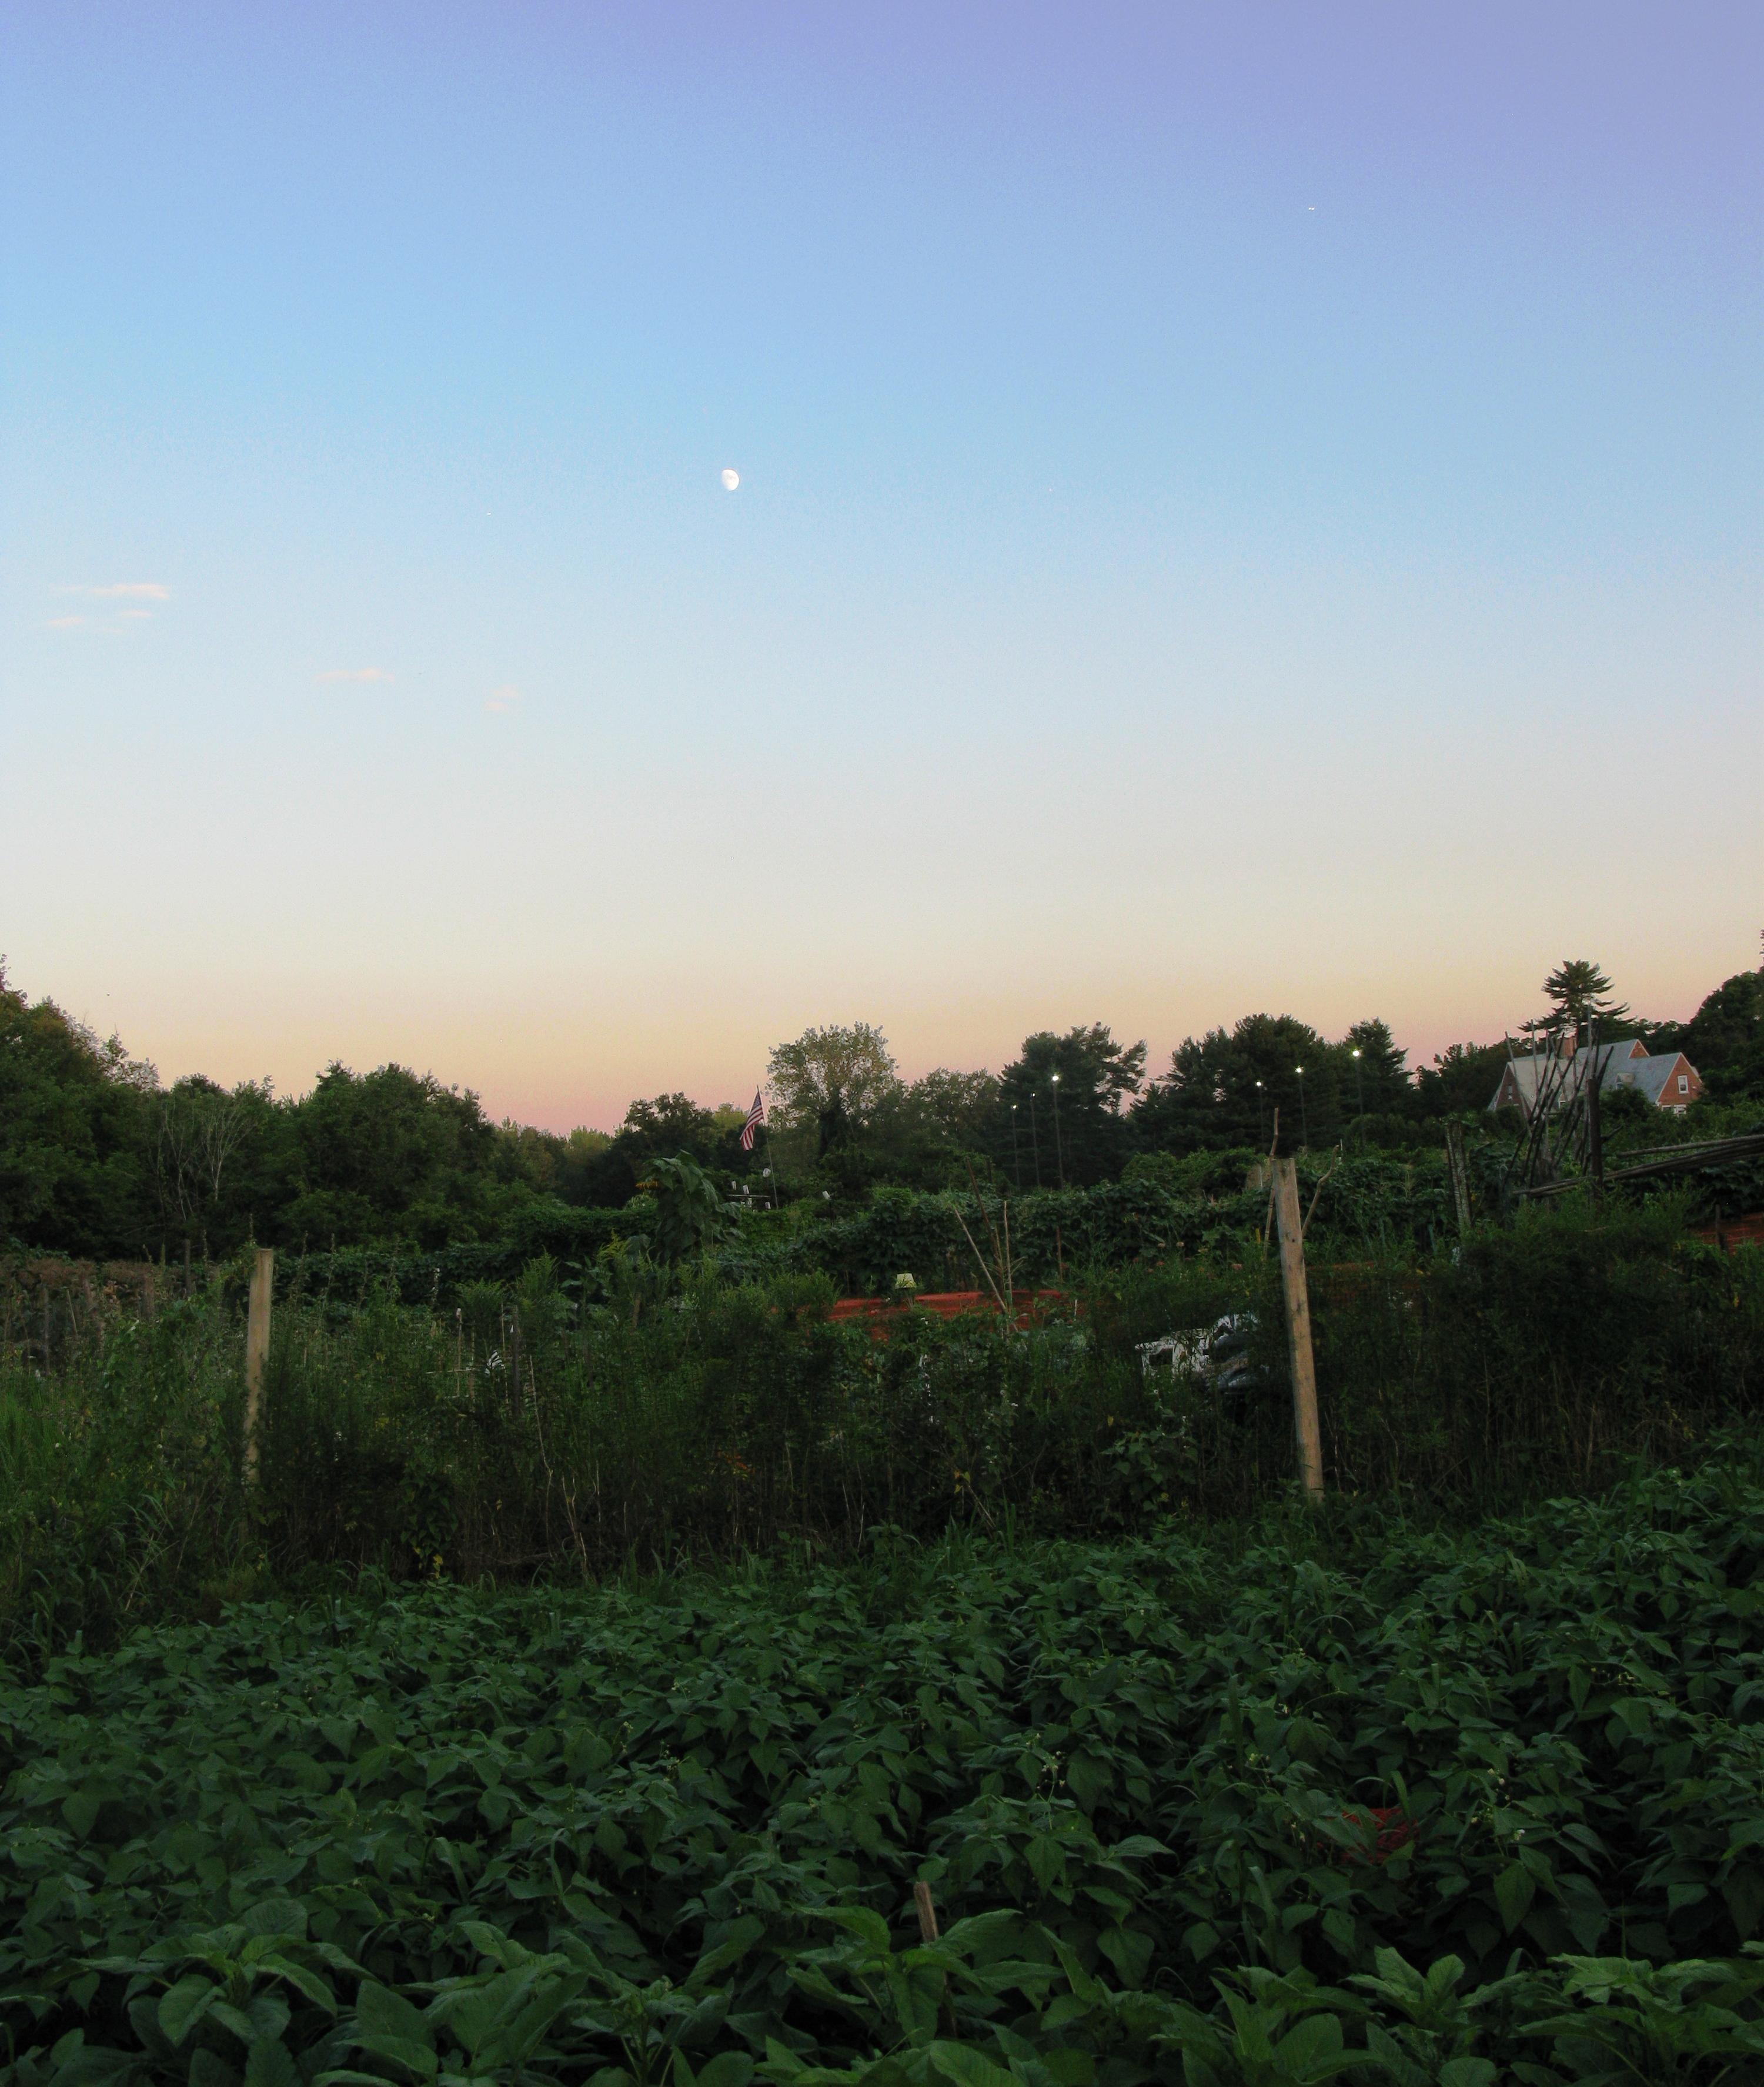 Hartford community garden tour uconnladybug 39 s blog for Under the garden moon